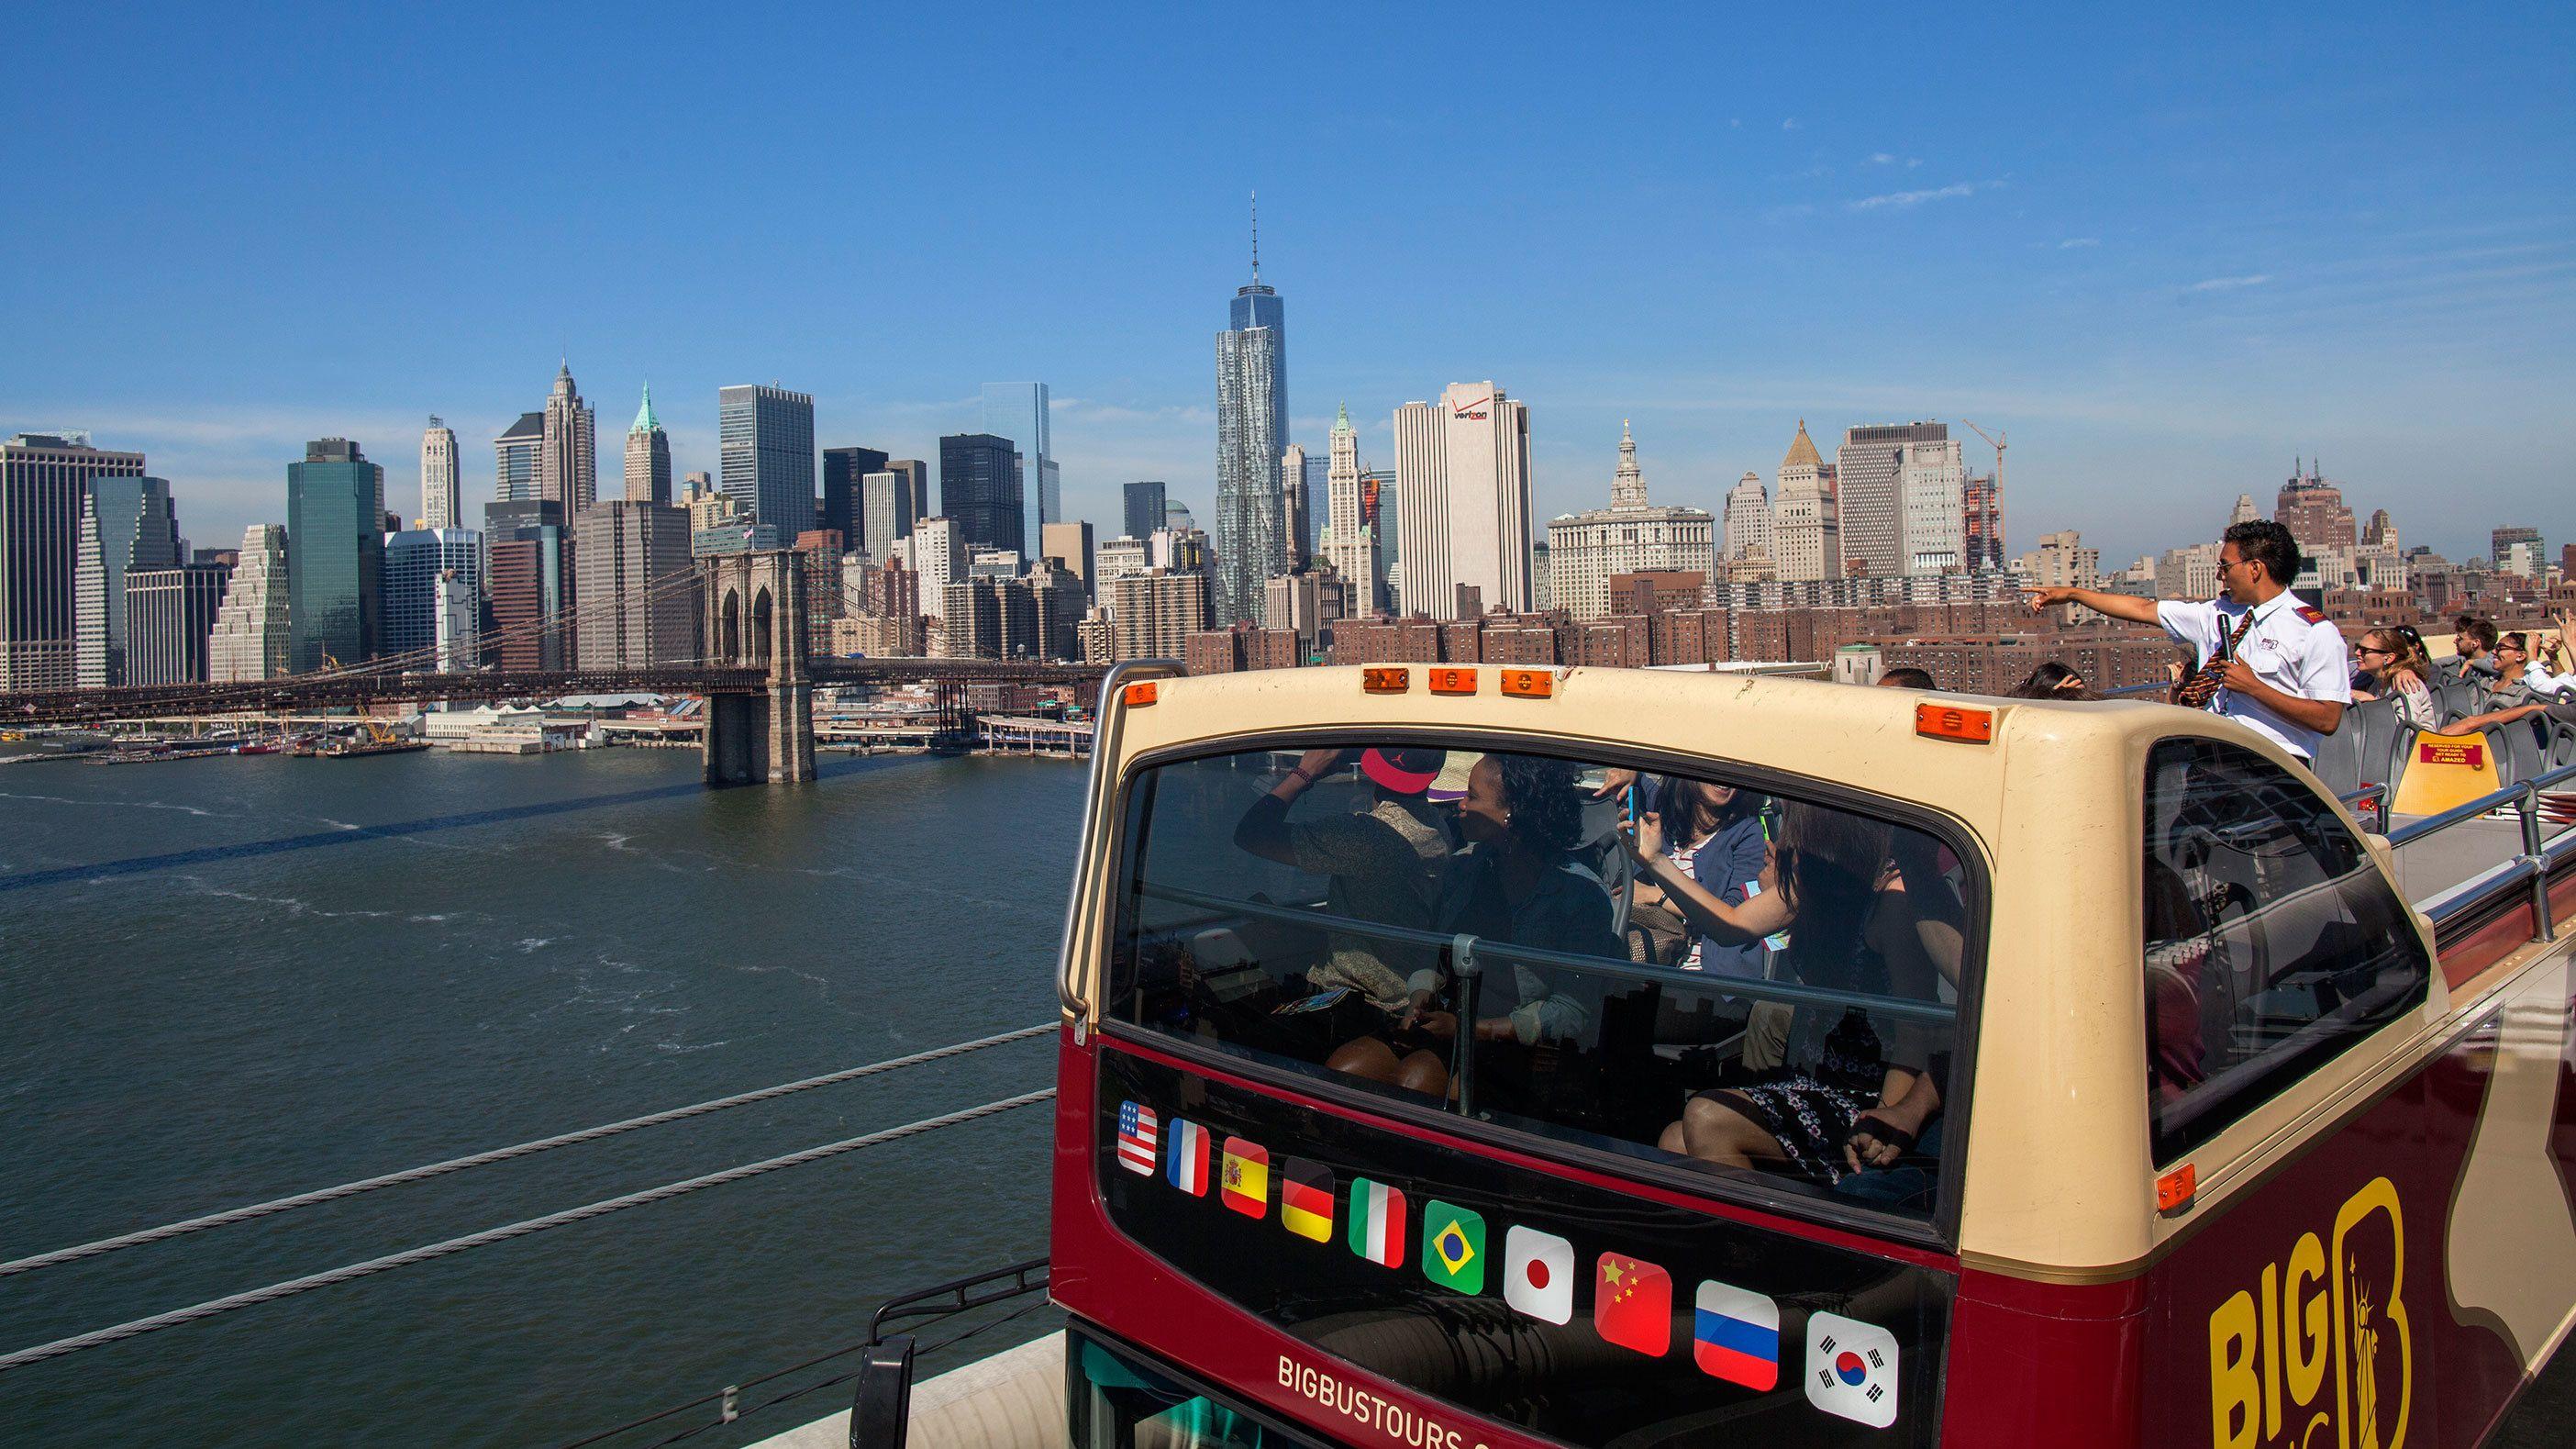 Tour bus going over a bridge in New York